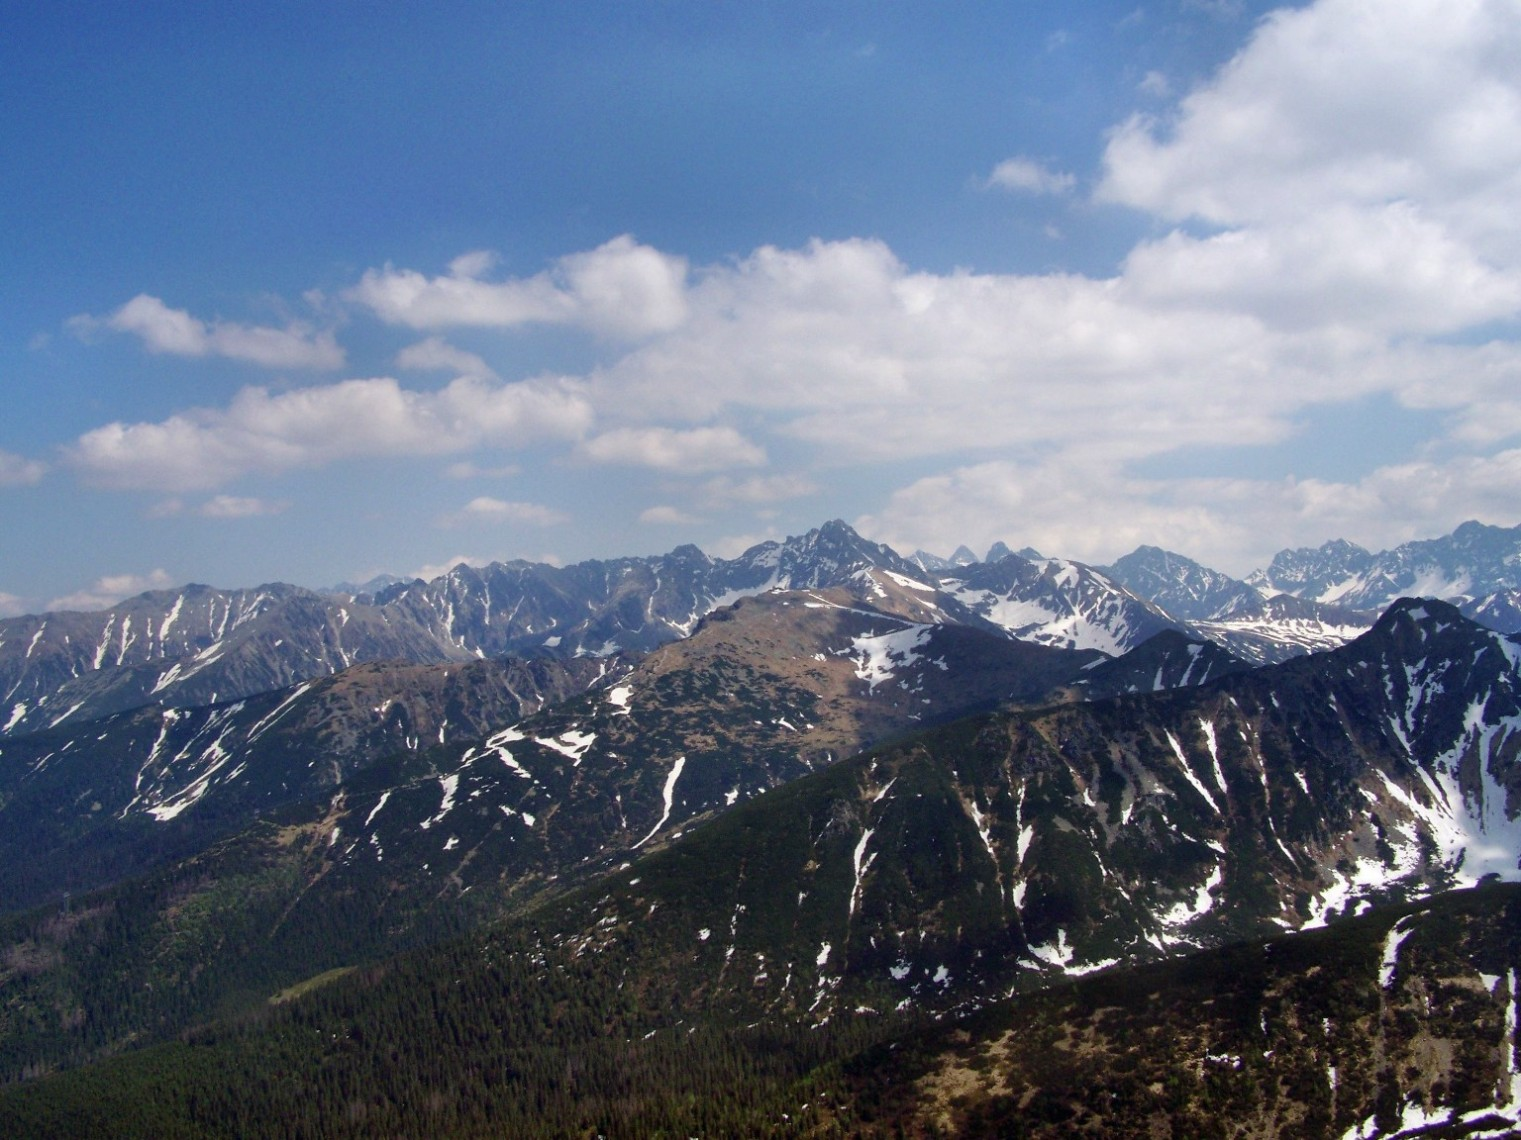 Widok z Giewontu na Tatry